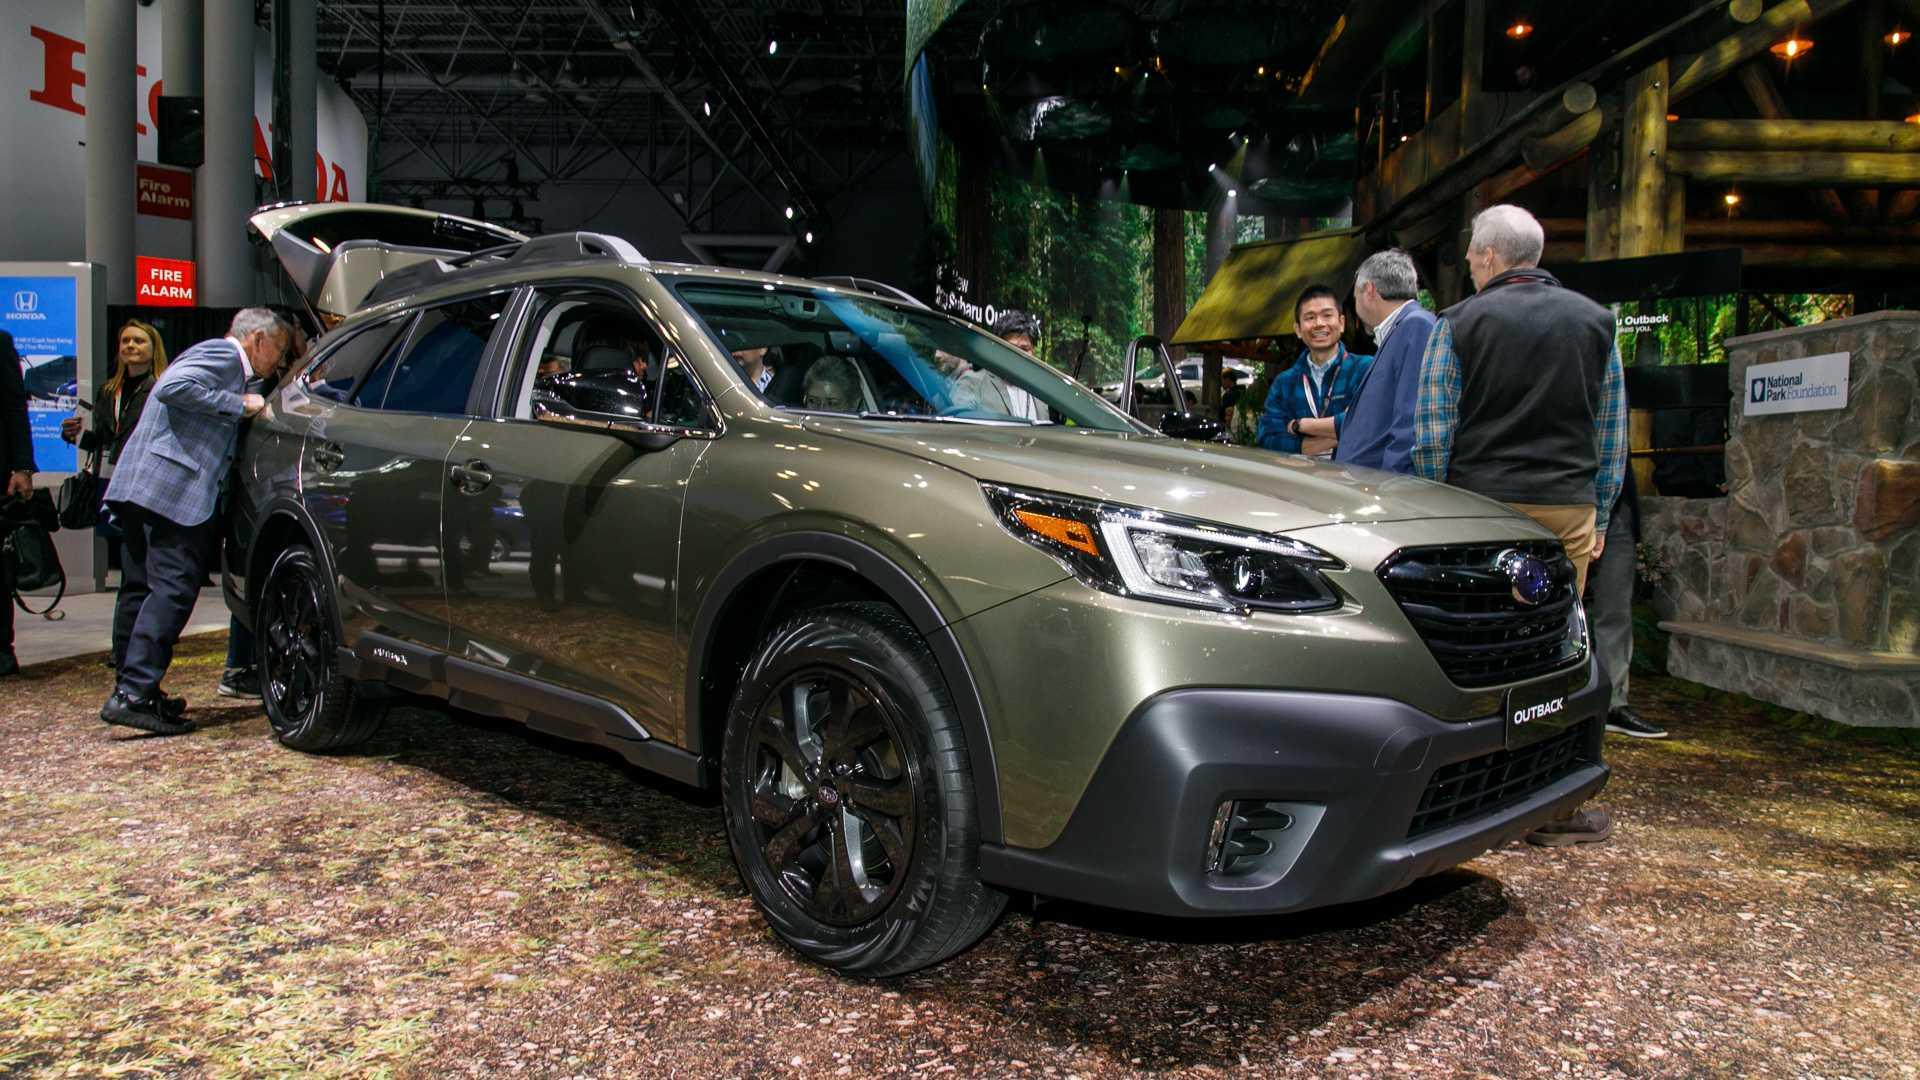 37 New Subaru Outback 2020 Uk Interior for Subaru Outback 2020 Uk